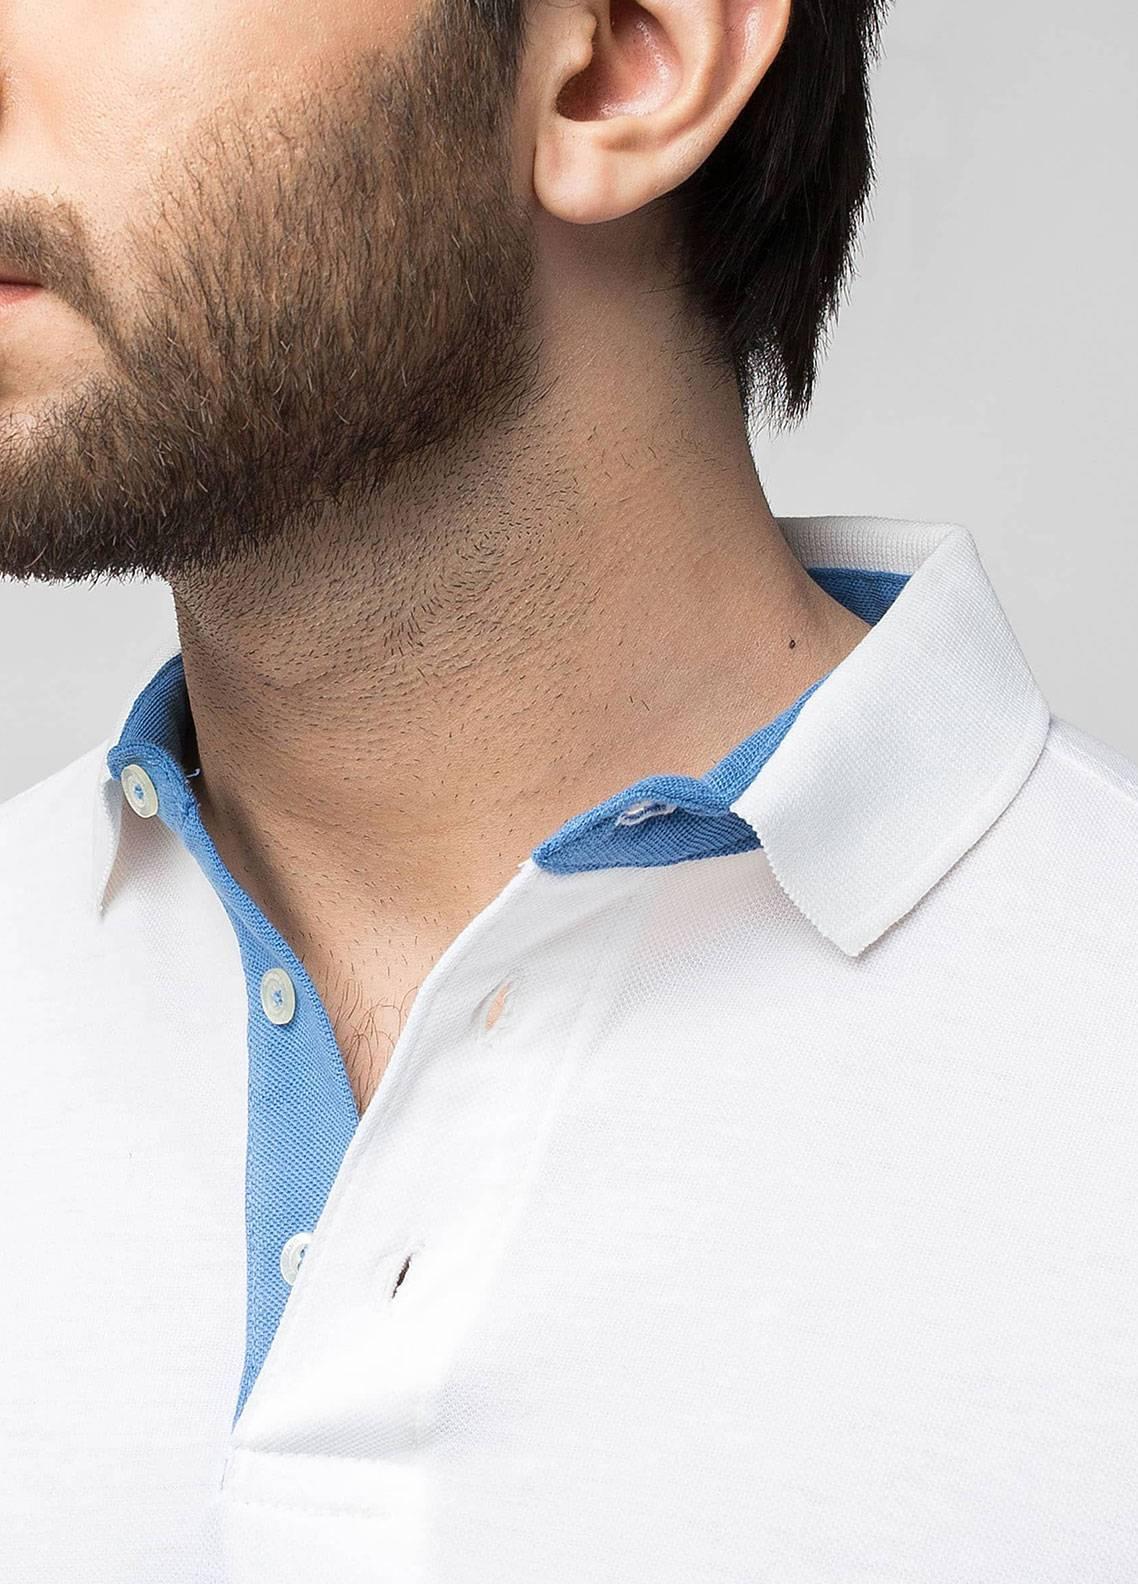 Brumano Cotton Polo Shirts for Men - White BRM-44-021